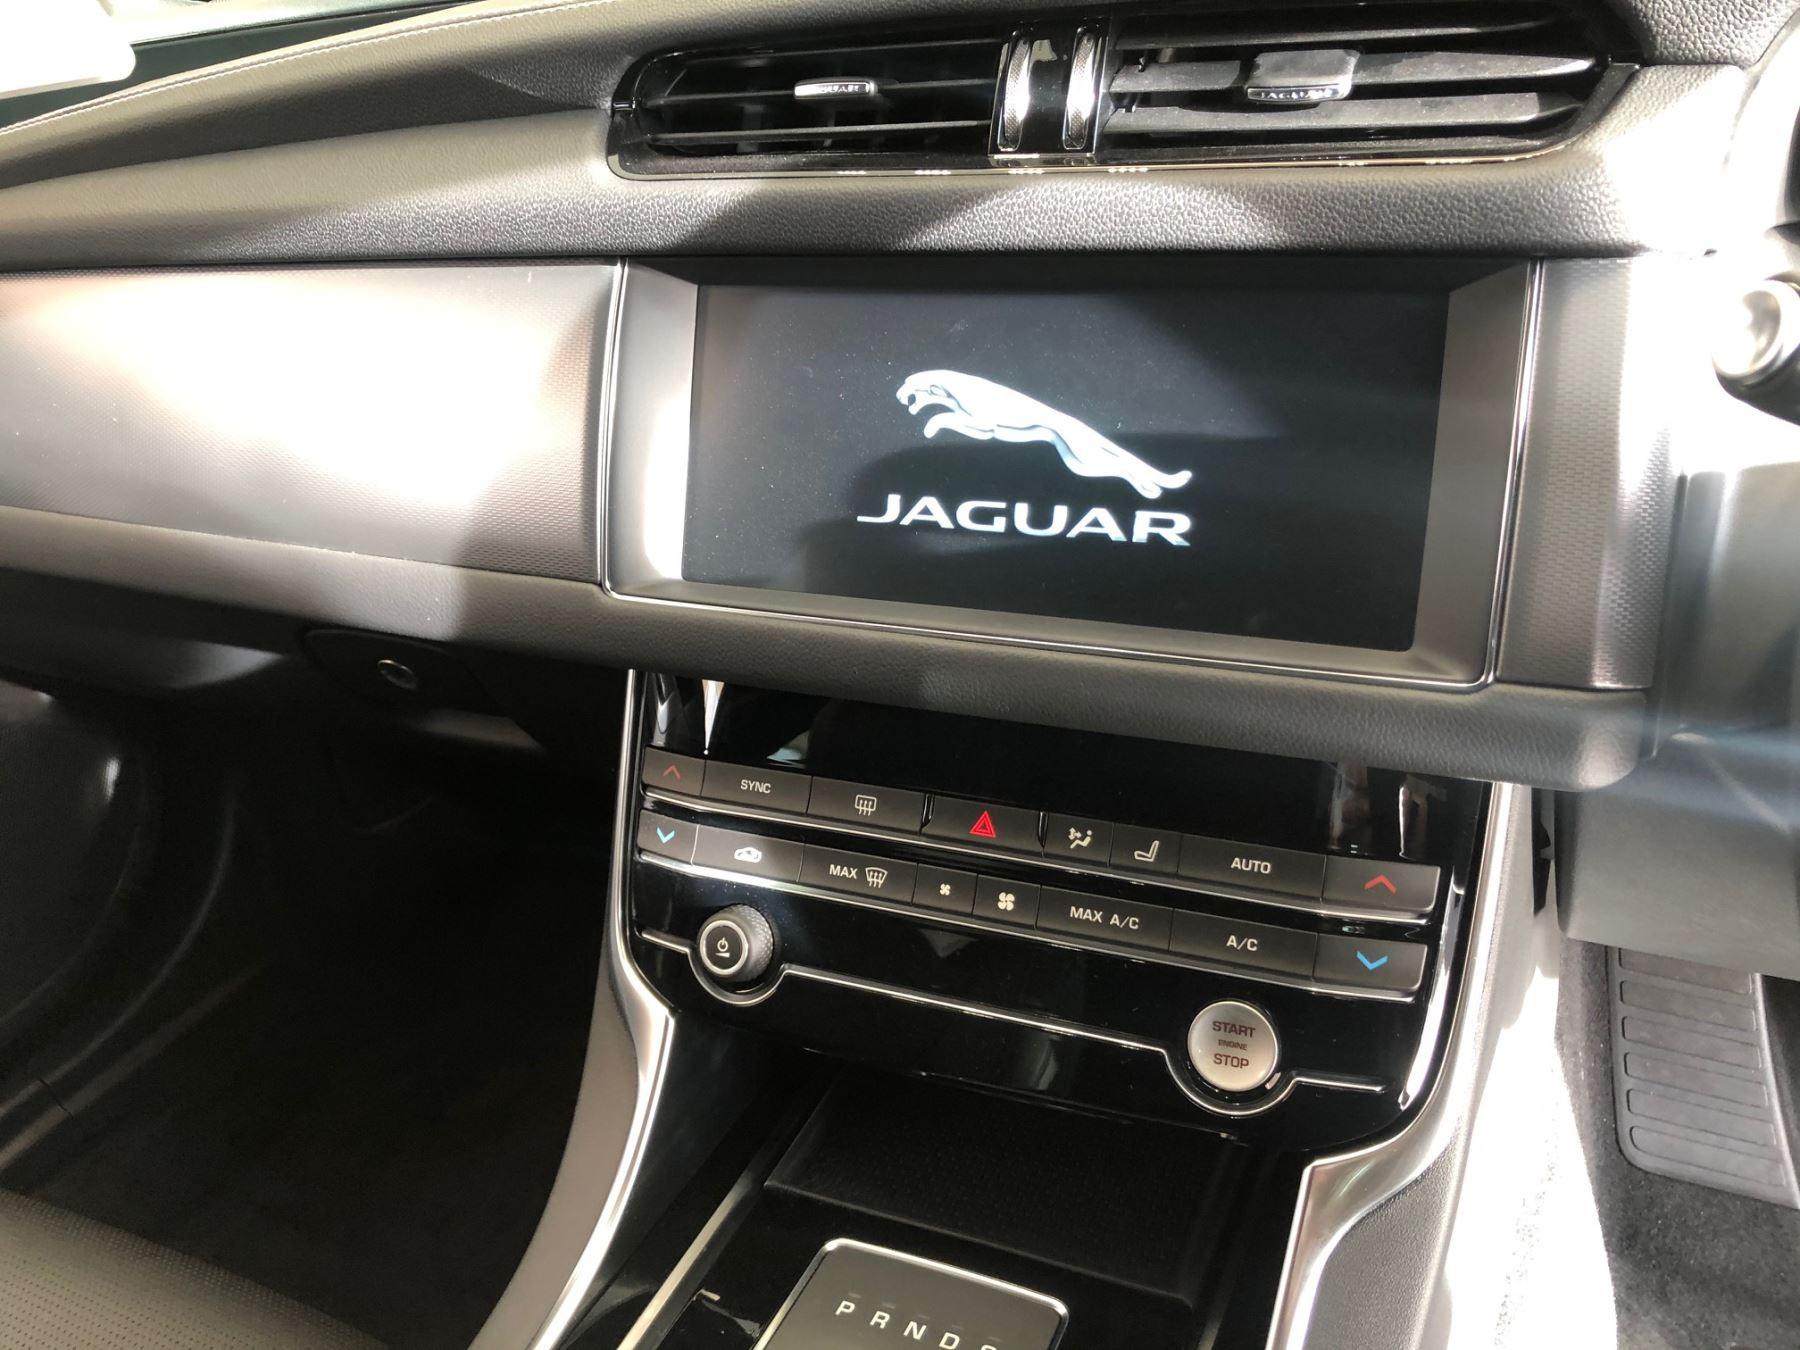 Jaguar XF SPORTBRAKE 2.0d 180 R-Sport image 16